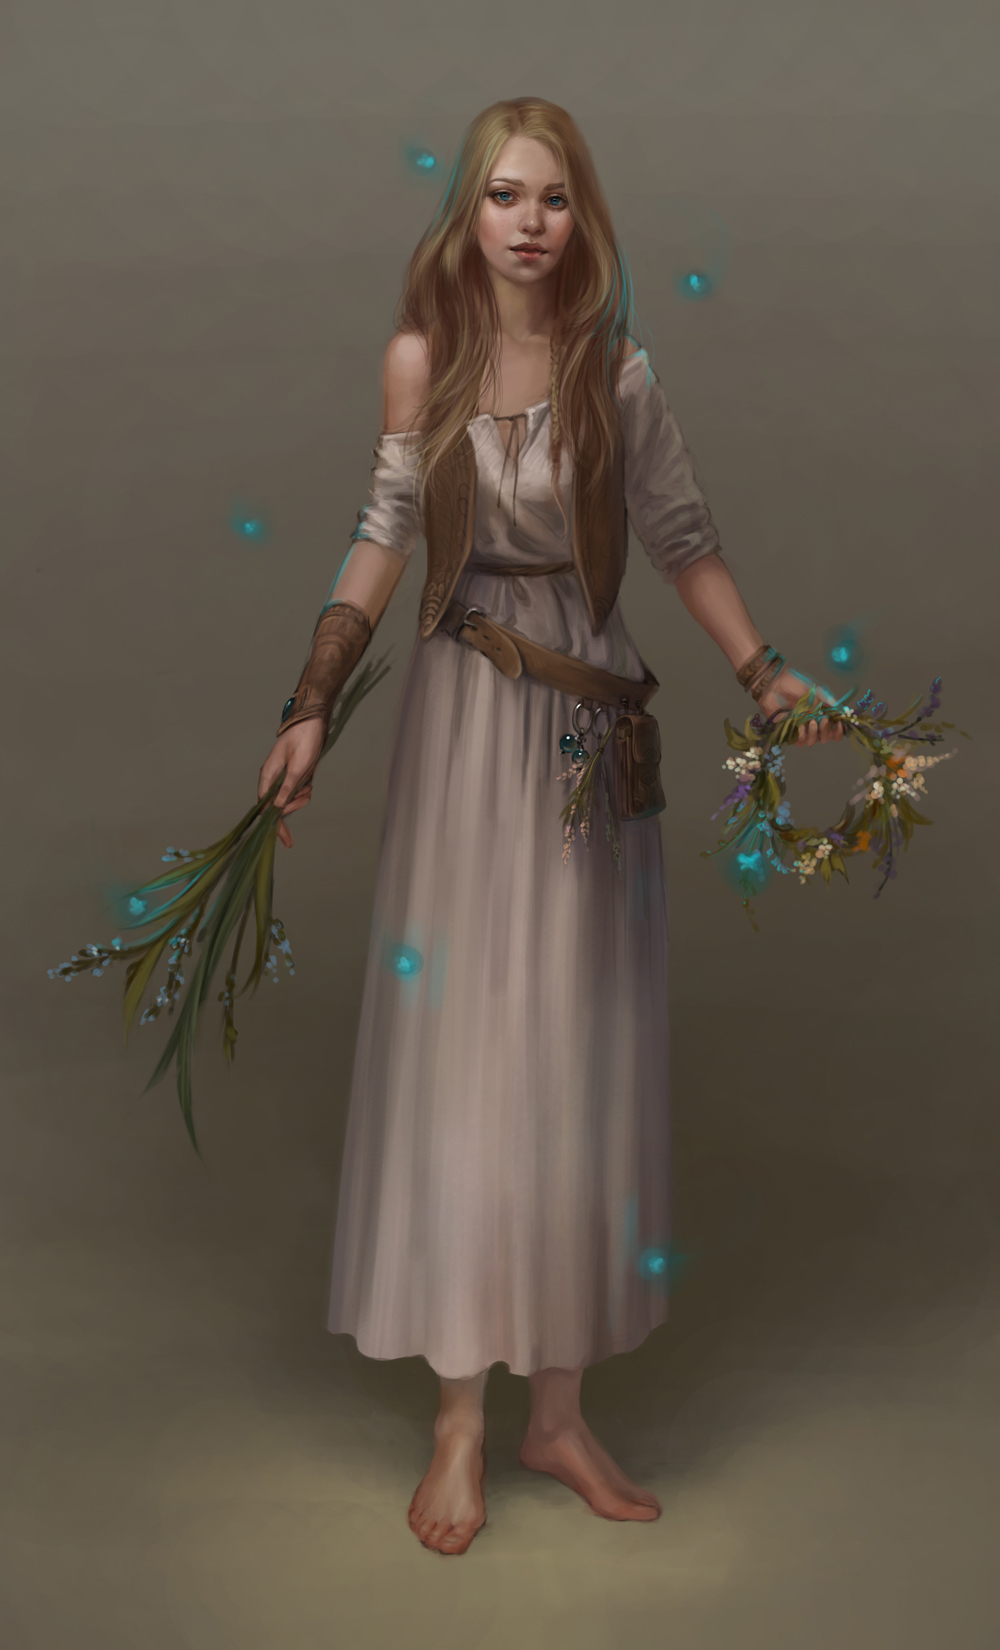 http://fc03.deviantart.net/fs71/f/2013/129/6/e/the_herbalist_by_goran_alena-d64mnqn.jpg